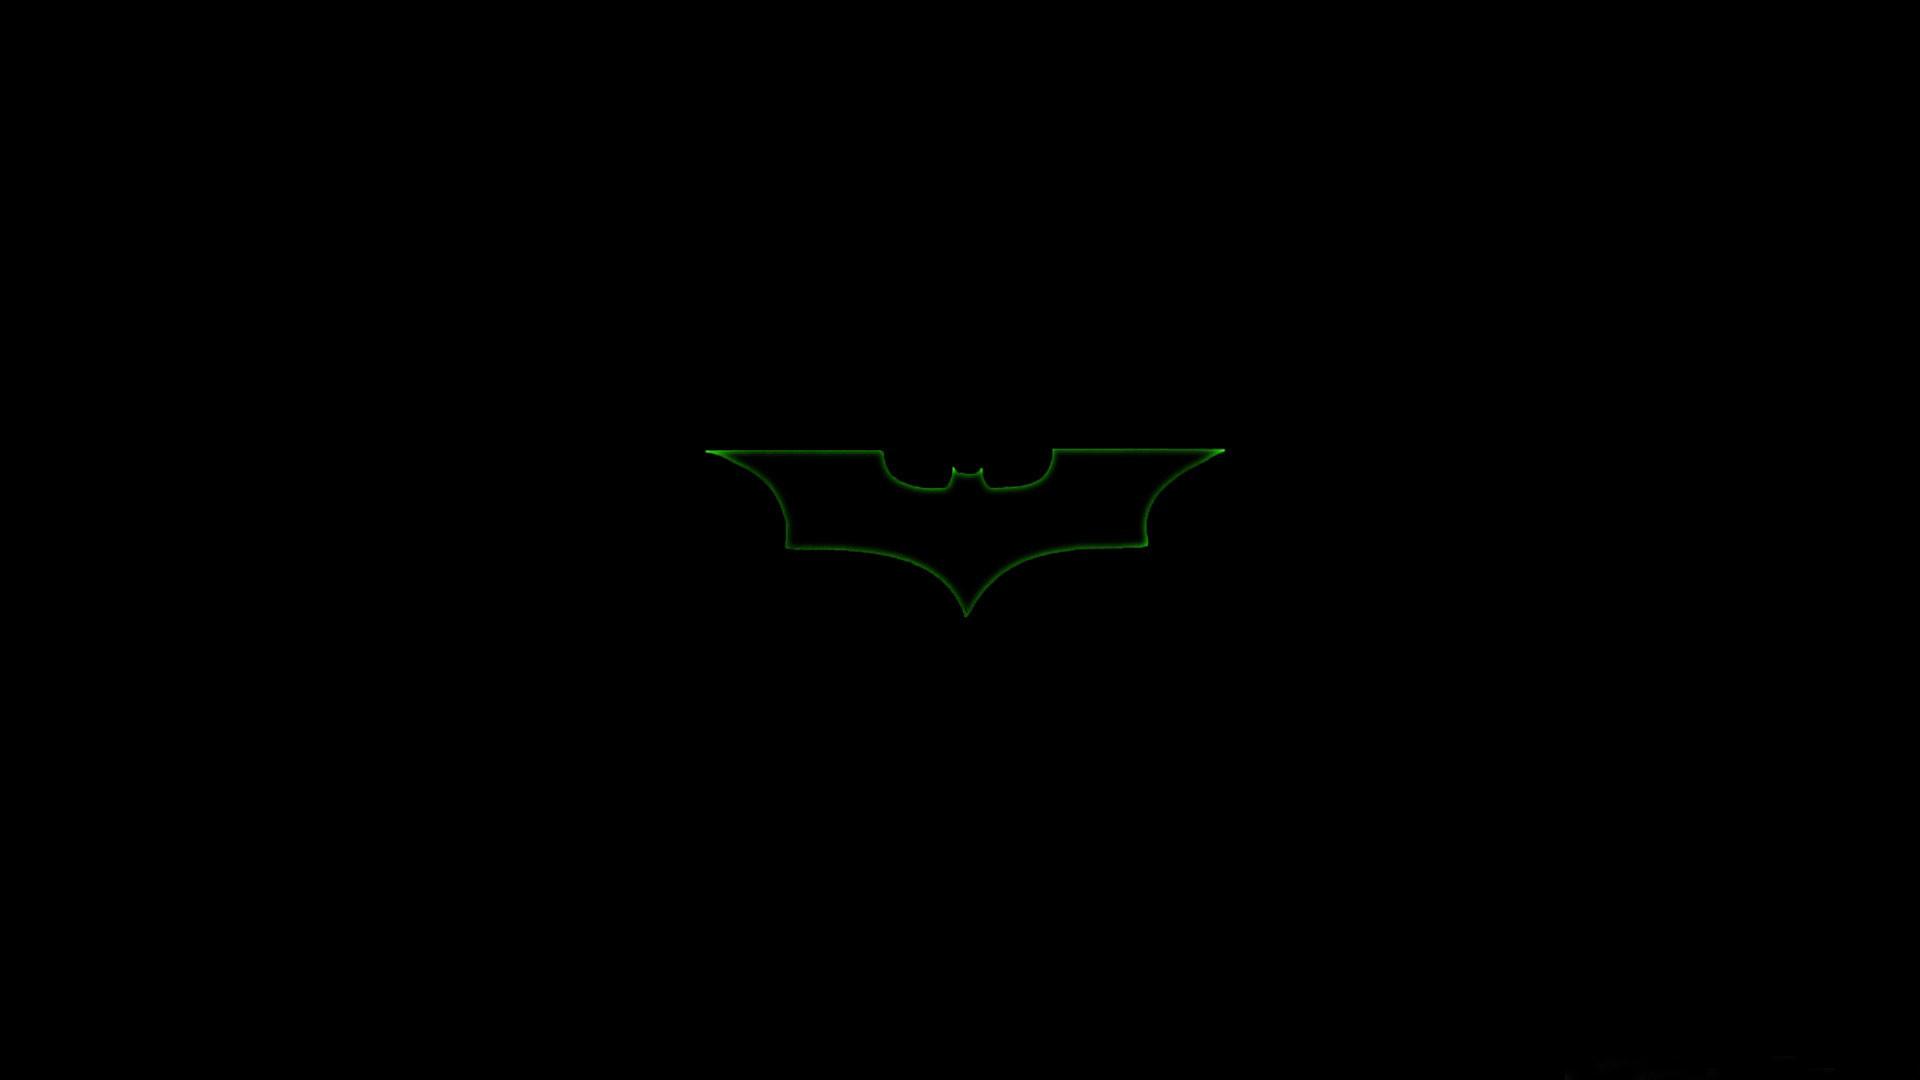 hd pics photos stunning batman logo dark green neon attractive hd quality desktop  background wallpaper